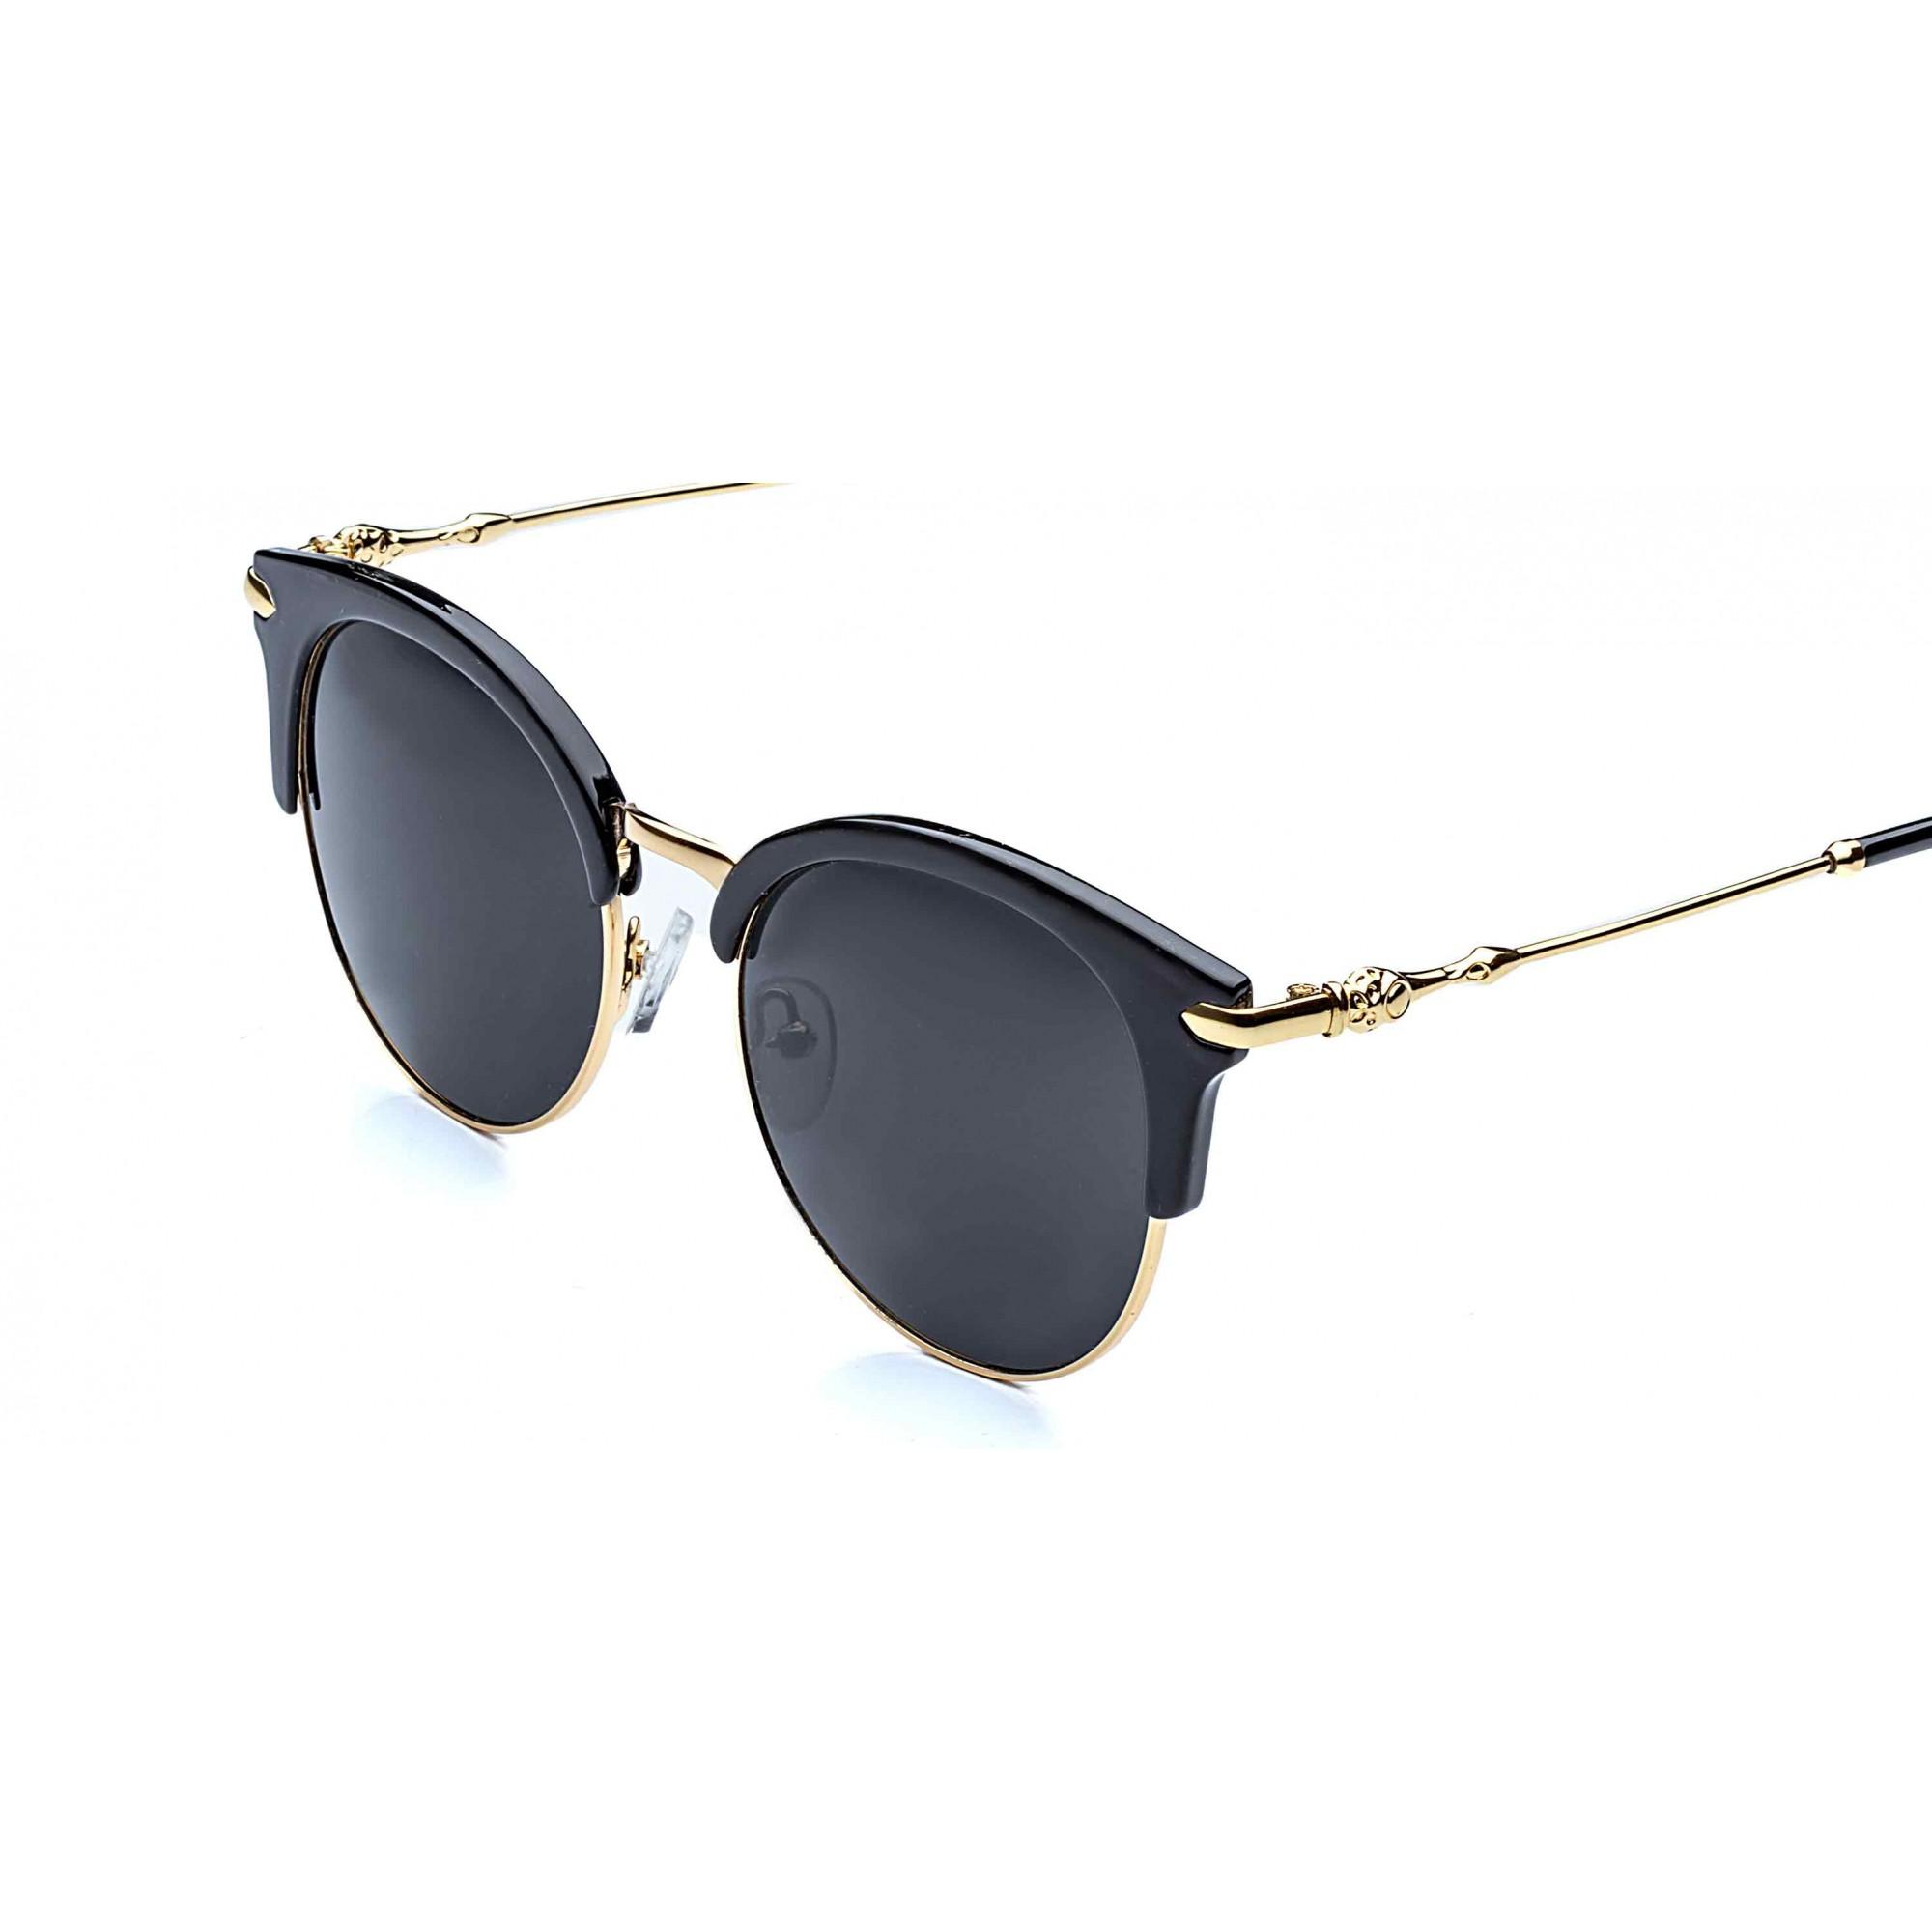 Óculos de Sol Wander + Lente Solar com Grau